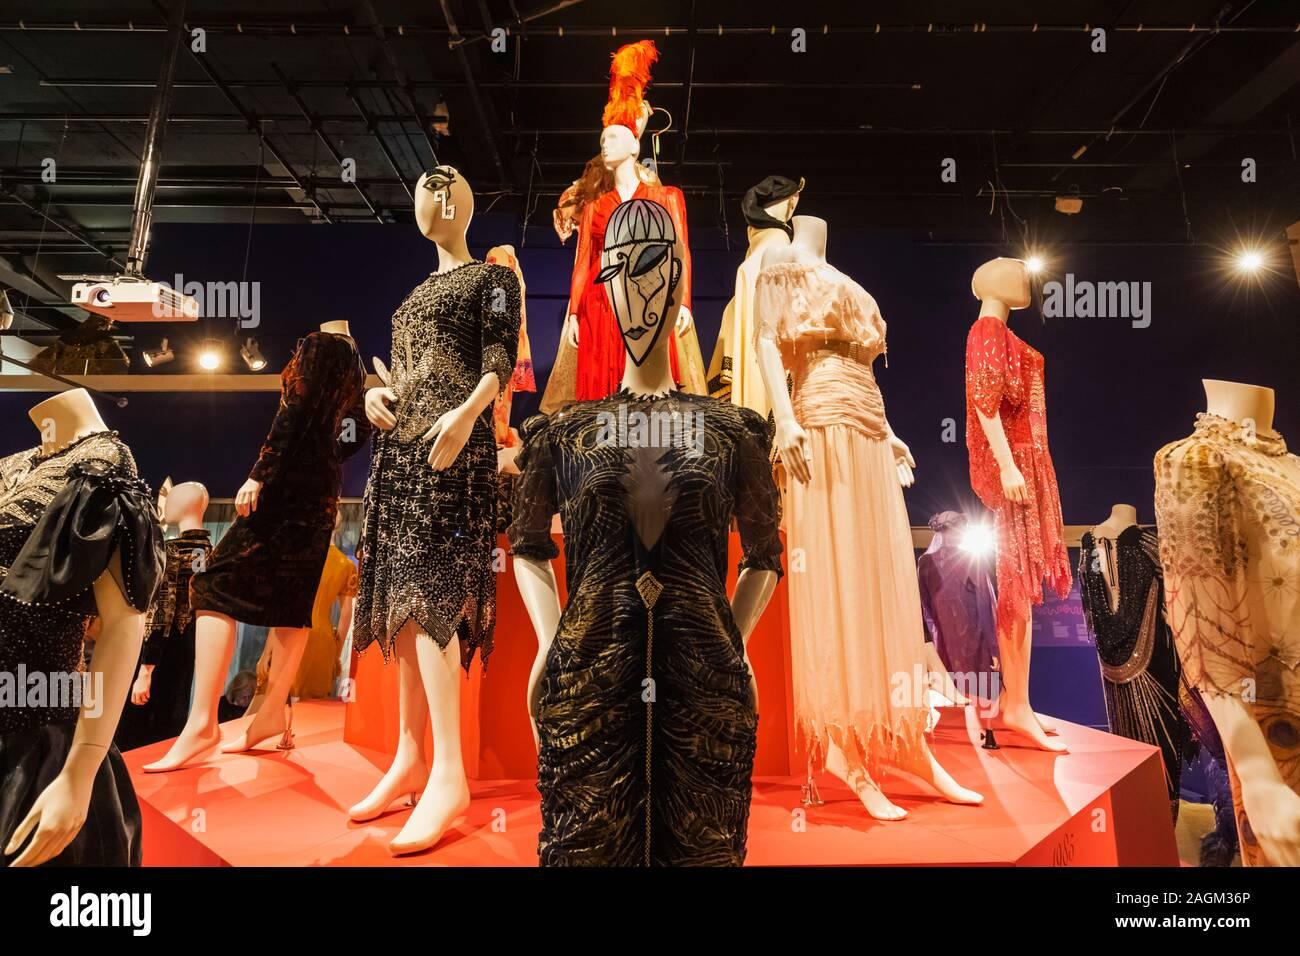 Fashion Designer Zandra Rhodes High Resolution Stock Photography And Images Alamy